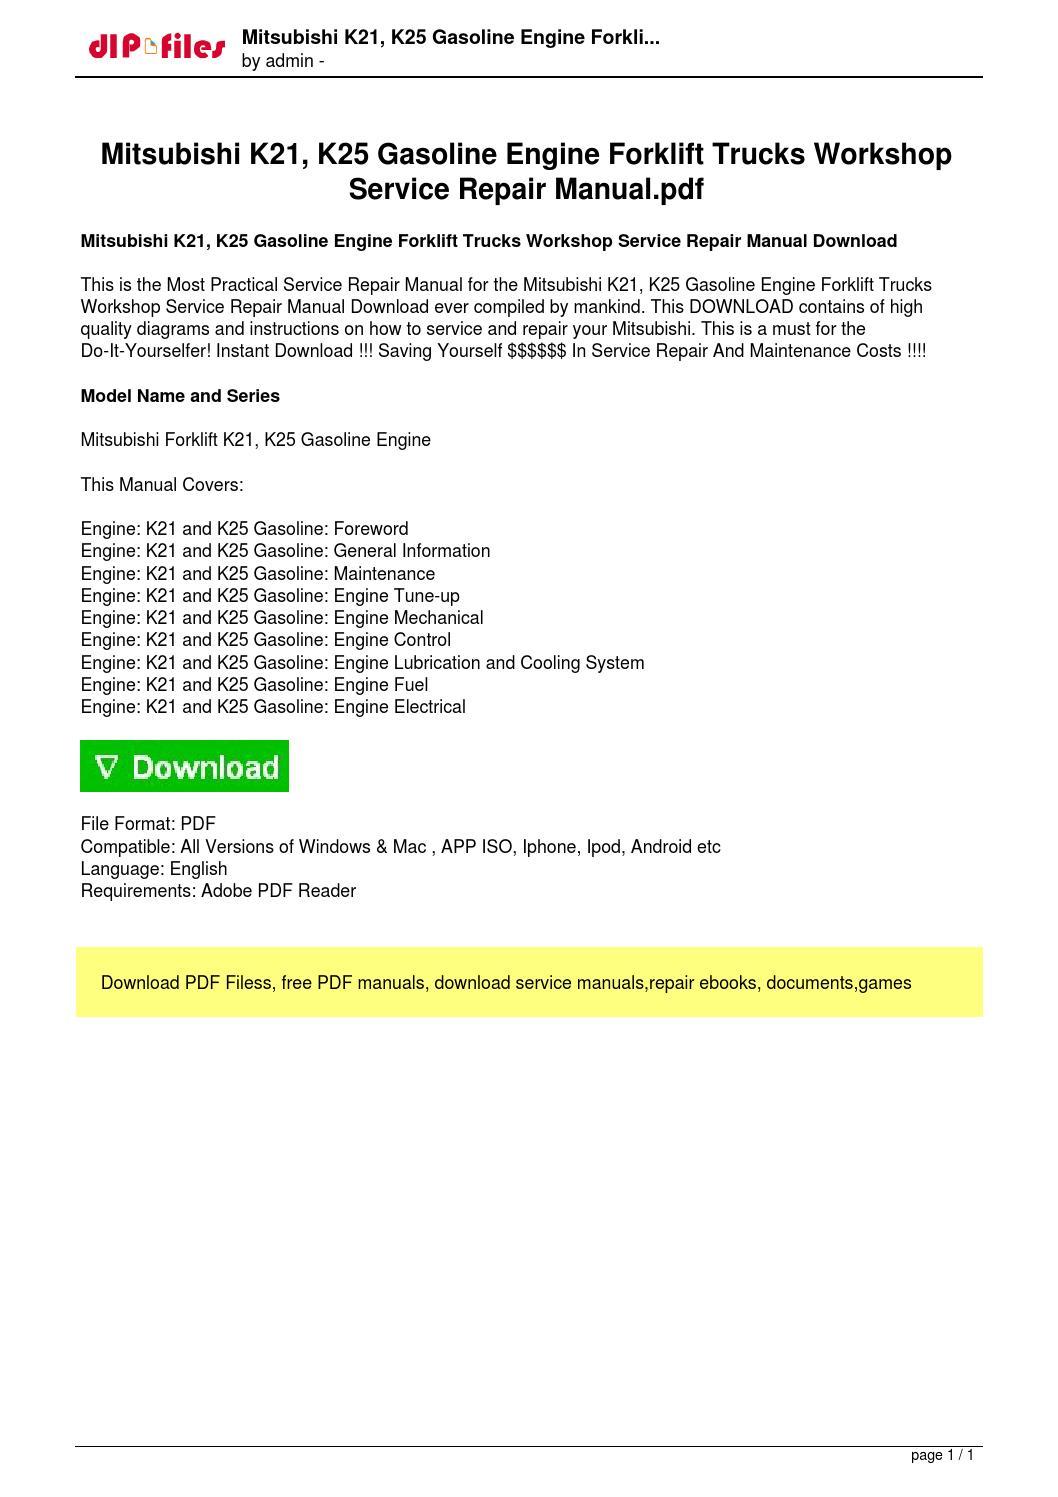 Mitsubishi 4d34 Engine Workshop Manual Pdf 2000 Mercury Cougar Owners 6d24 Diesel Repair Shop